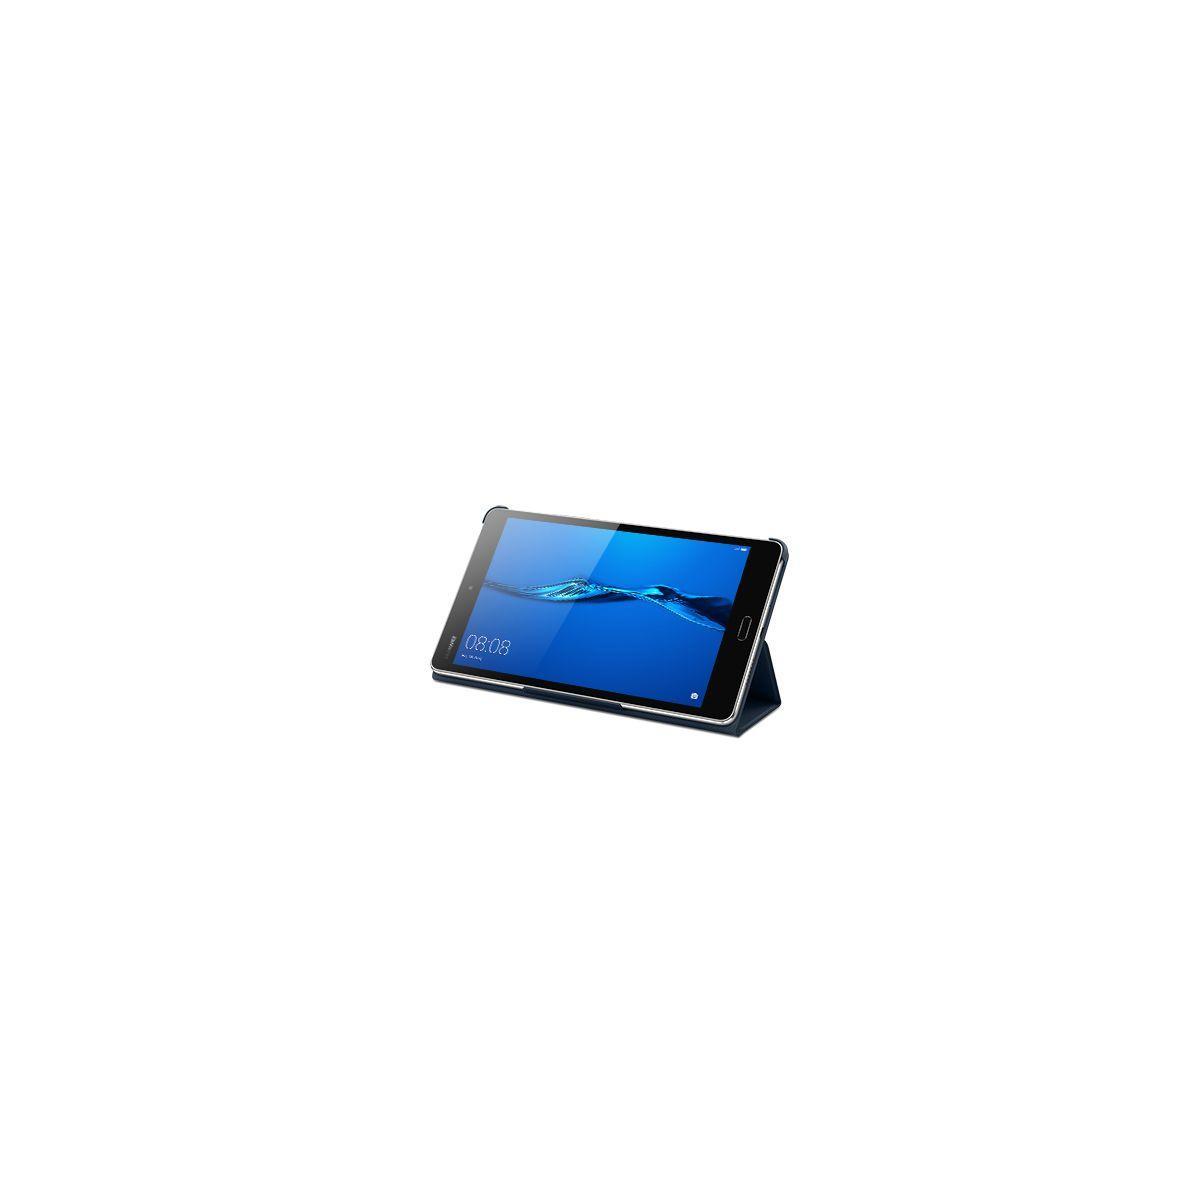 Etui tablette huawei mediapad m3 lite 10 blue - livraison offerte : code premium (photo)